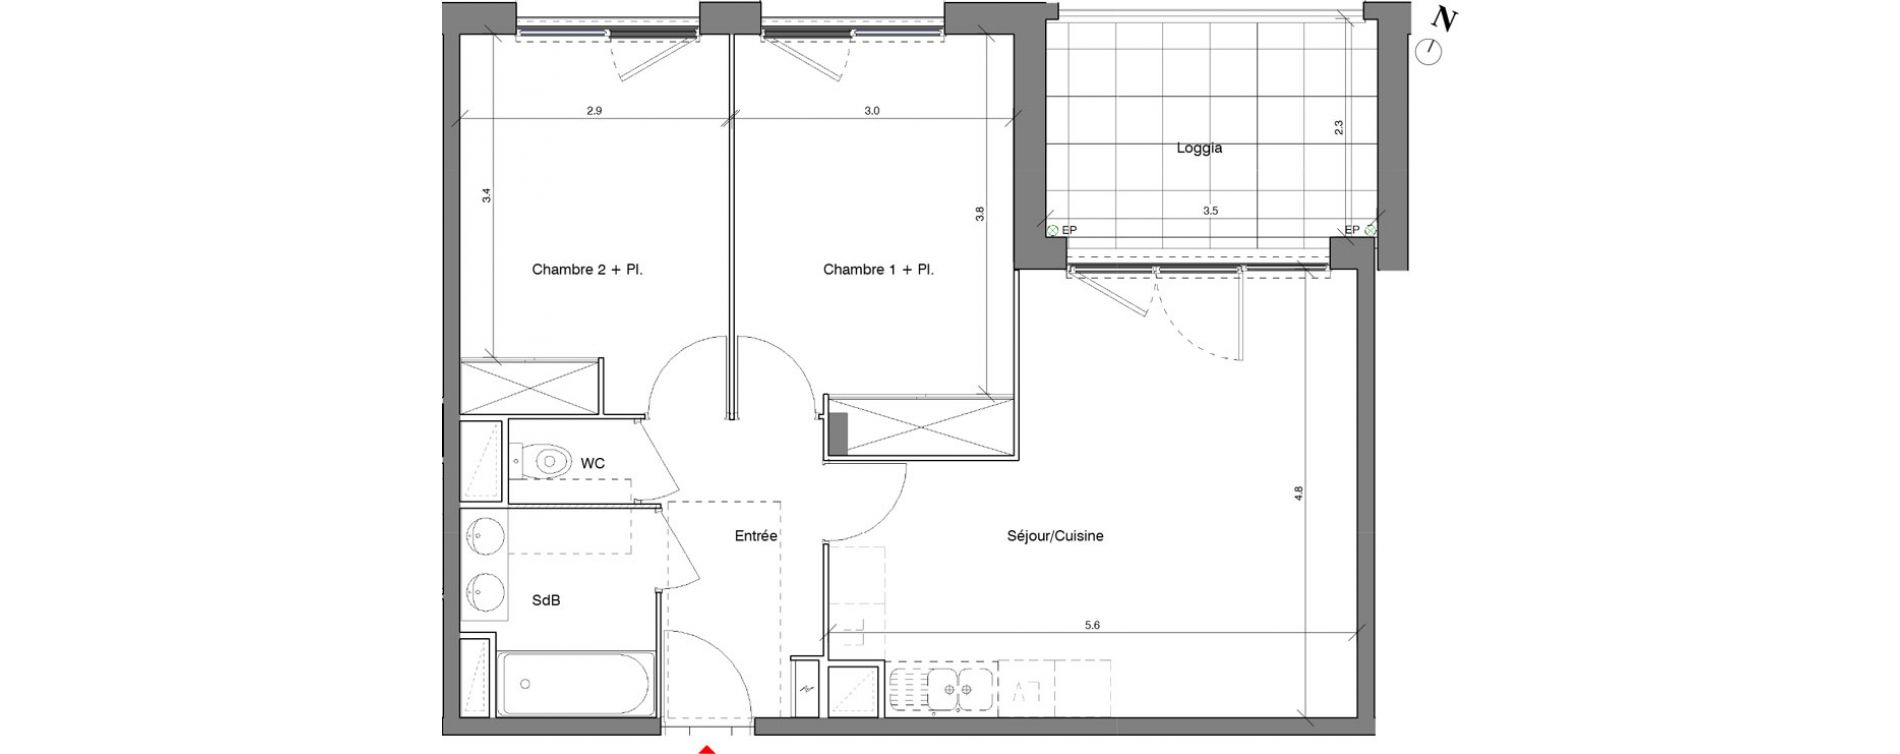 Appartement T3 de 57.80 m2 1er étage N Kubik Garden